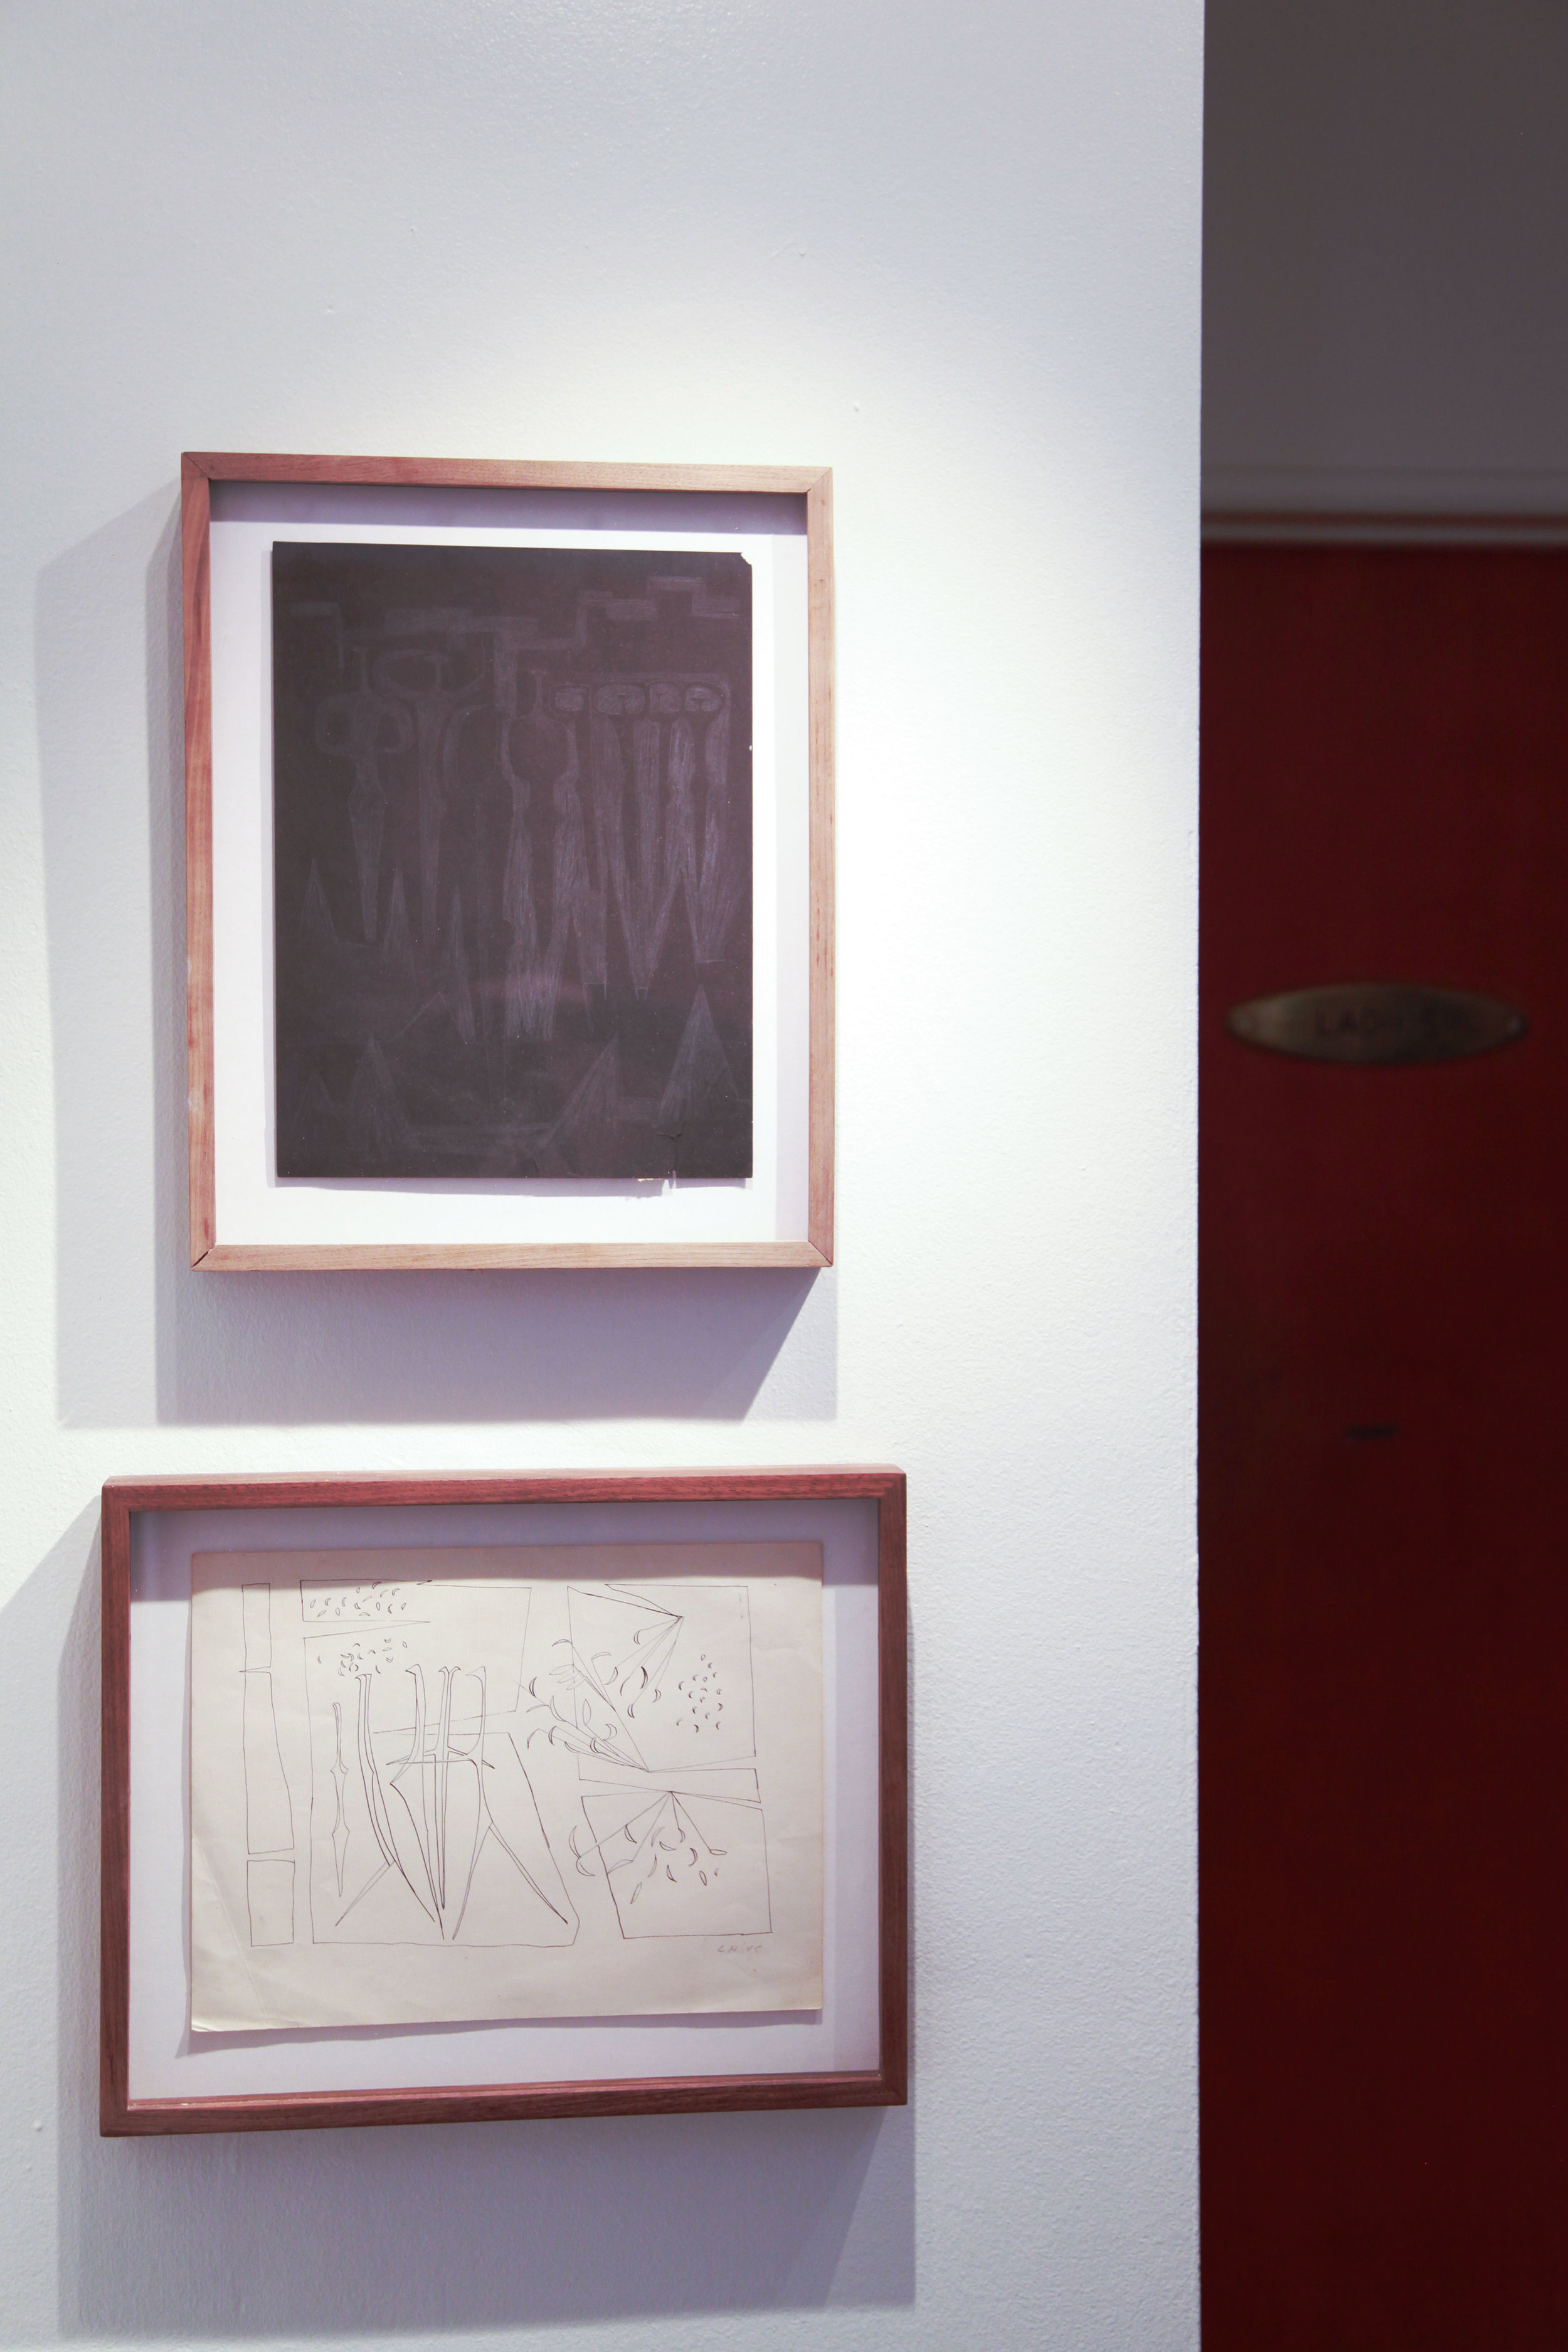 Installation view: Luchita Hurtado